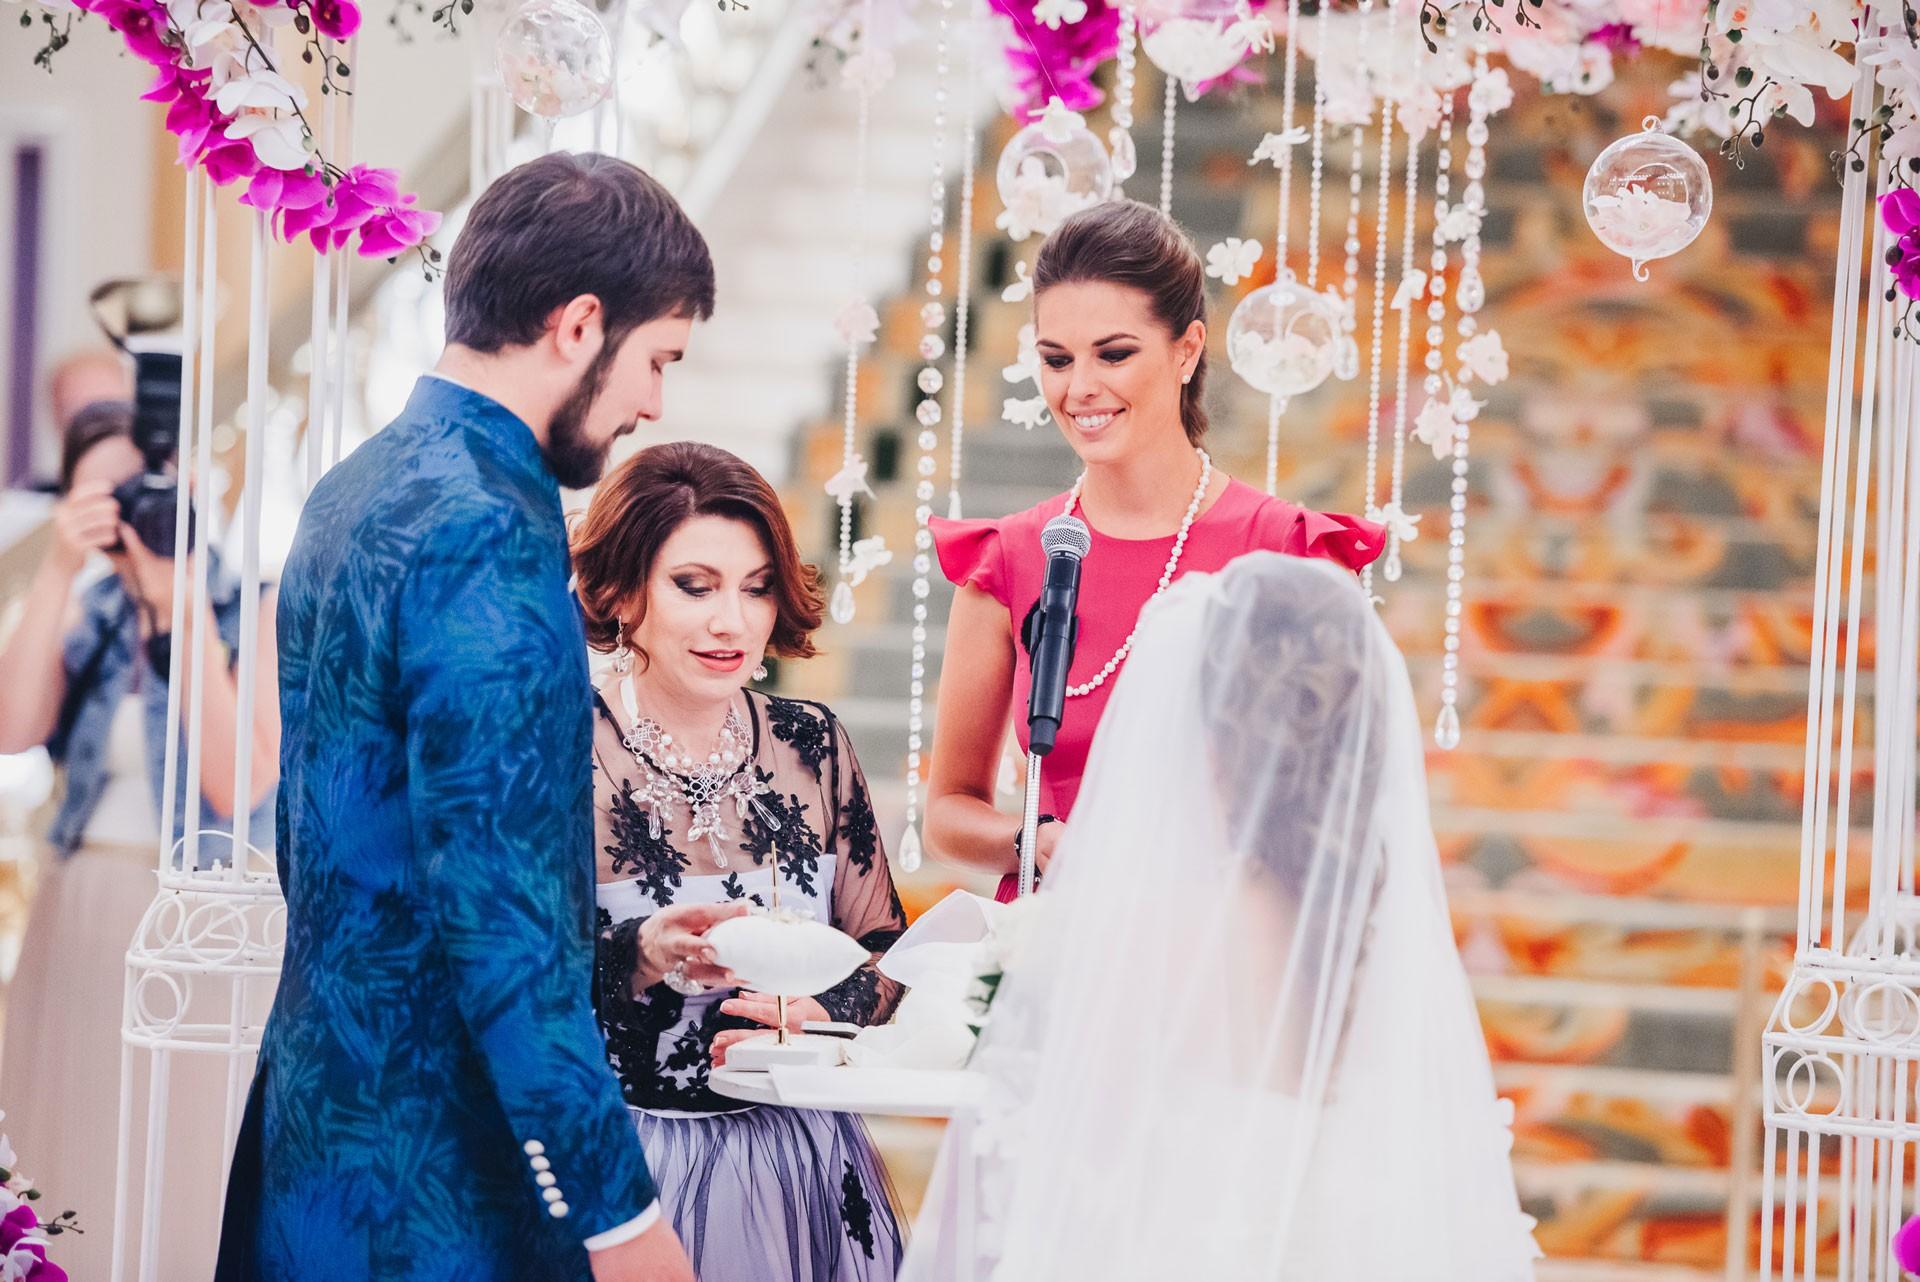 Свадьба Ксении Сябитовой и Андрея Снеткова фото 5